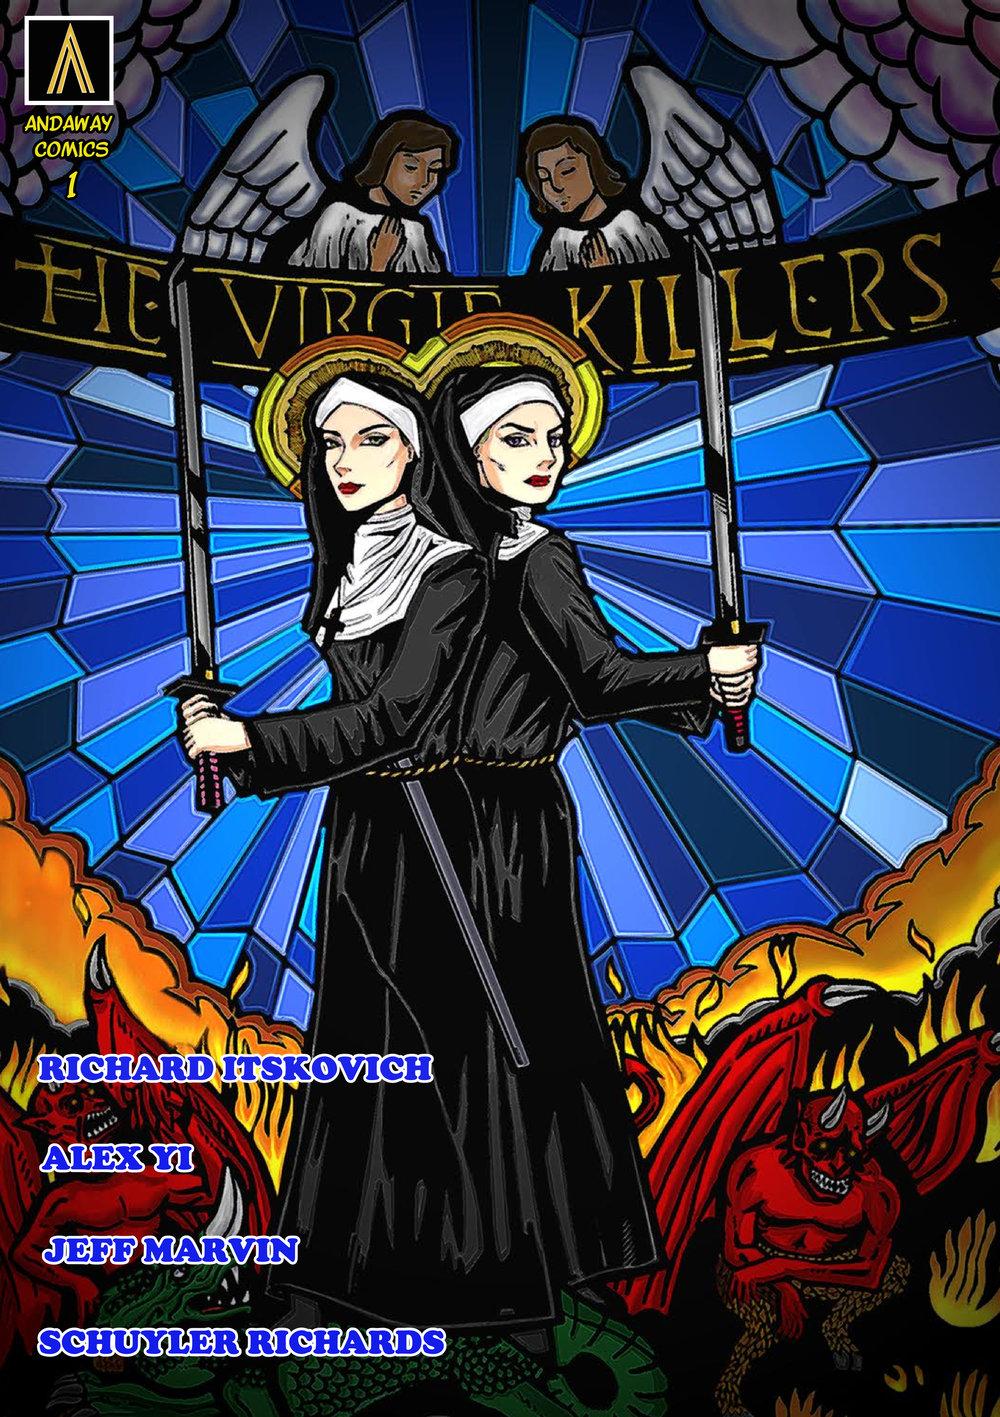 VIRGIN KILLERS COVER.jpg